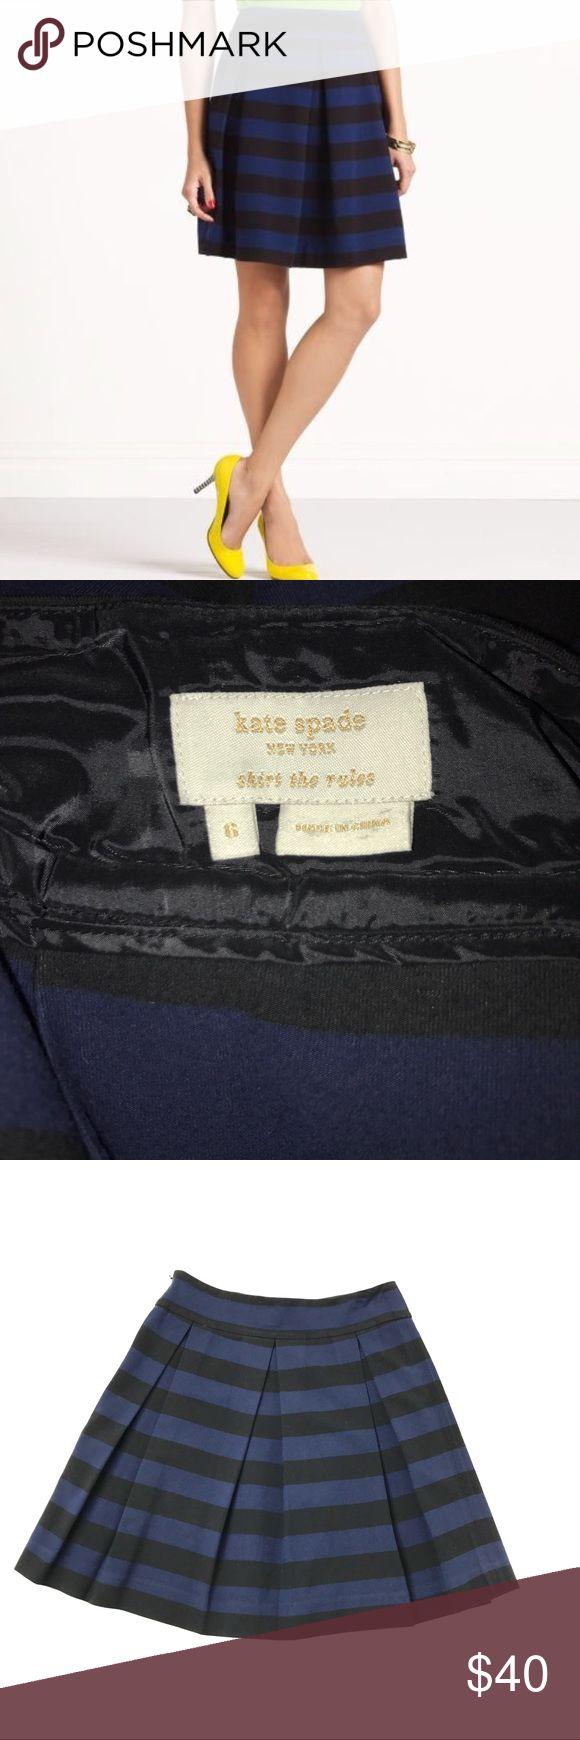 "Kate Spade Striped A Line Skirt Black Blue Size 6 Kate Spade 'Skirt The Rules' Black & Blue Striped A Line Skirt Size 6  Waist: 15""  Length: 20""  Condition: Excellent pre-owned condition. kate spade Skirts A-Line or Full"